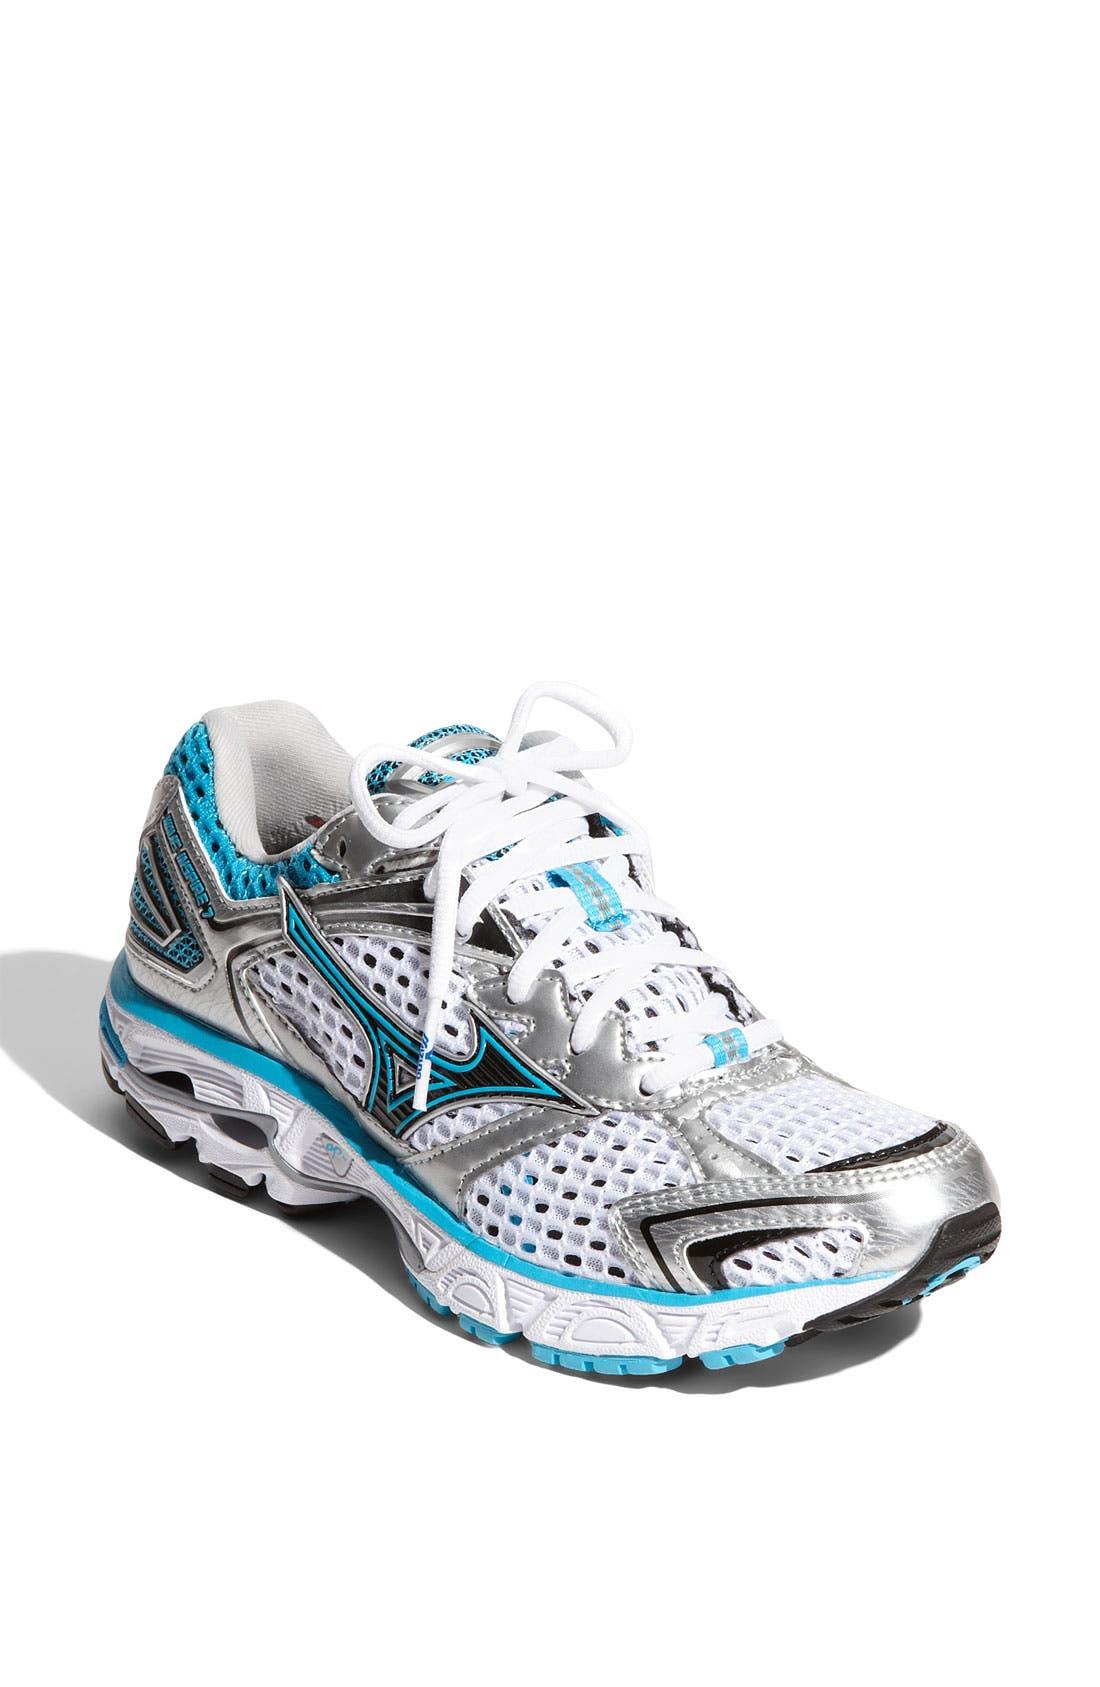 mizuno running shoes nordstrom zero